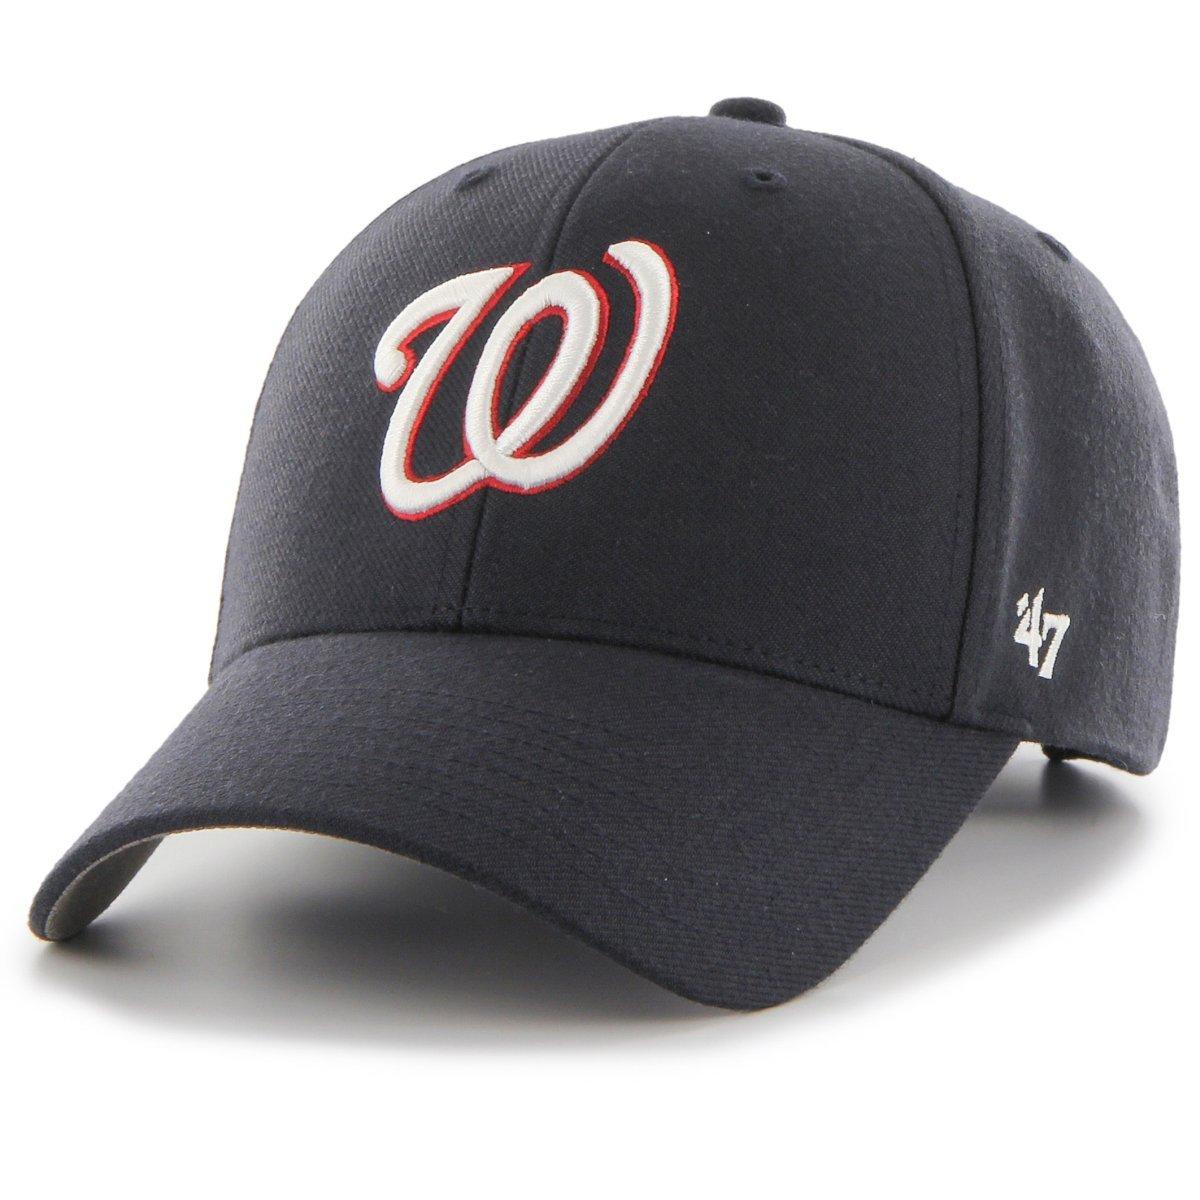 '47 MLB Washington Nationals '47 MVP Cap 47 Brand